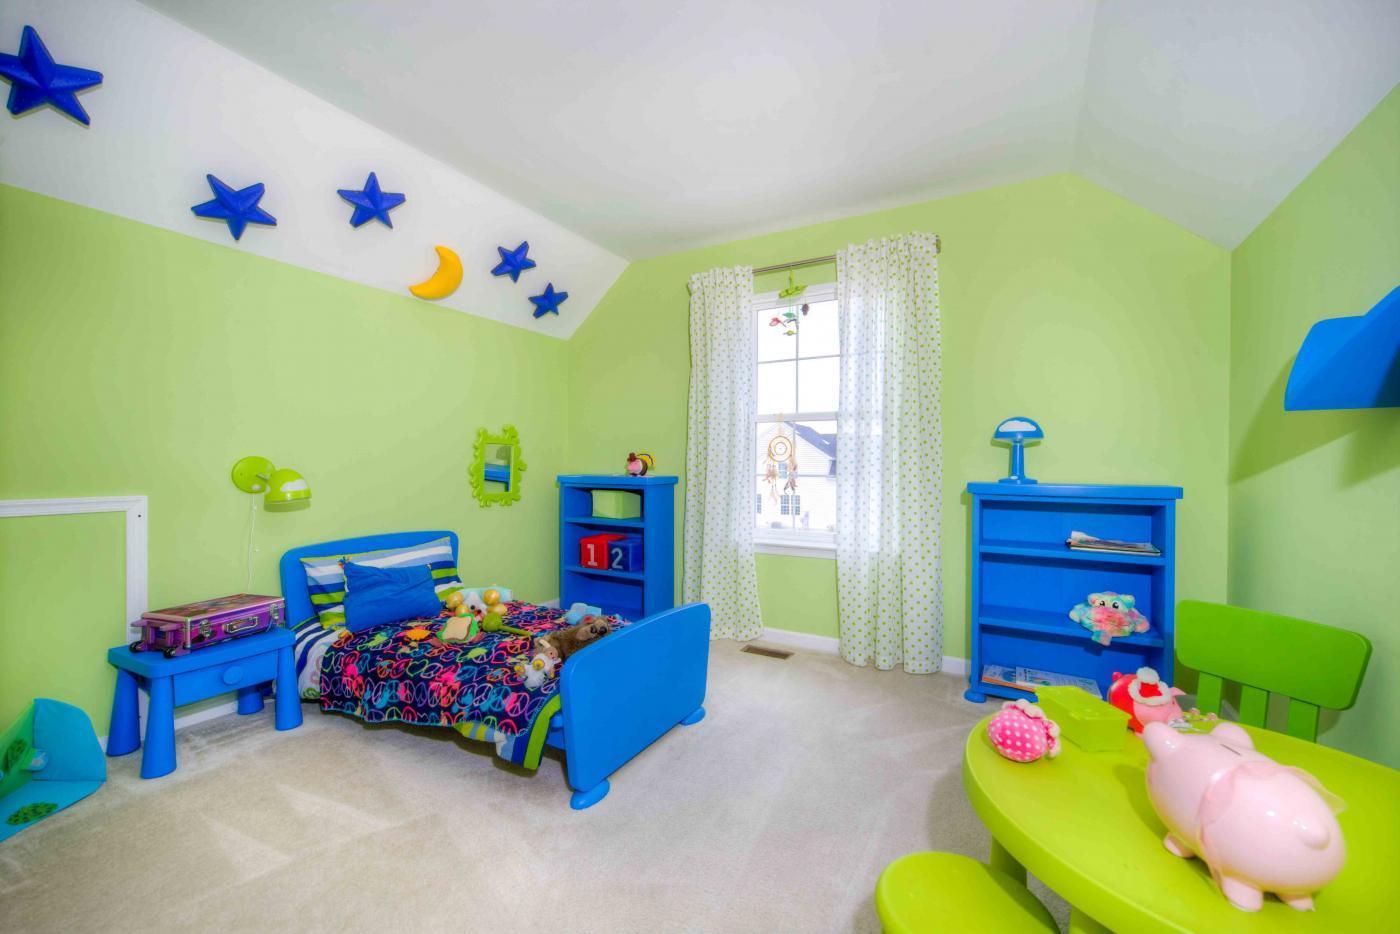 Bedroom featured in the Daggerwing II By Kay Builders in Allentown-Bethlehem, PA